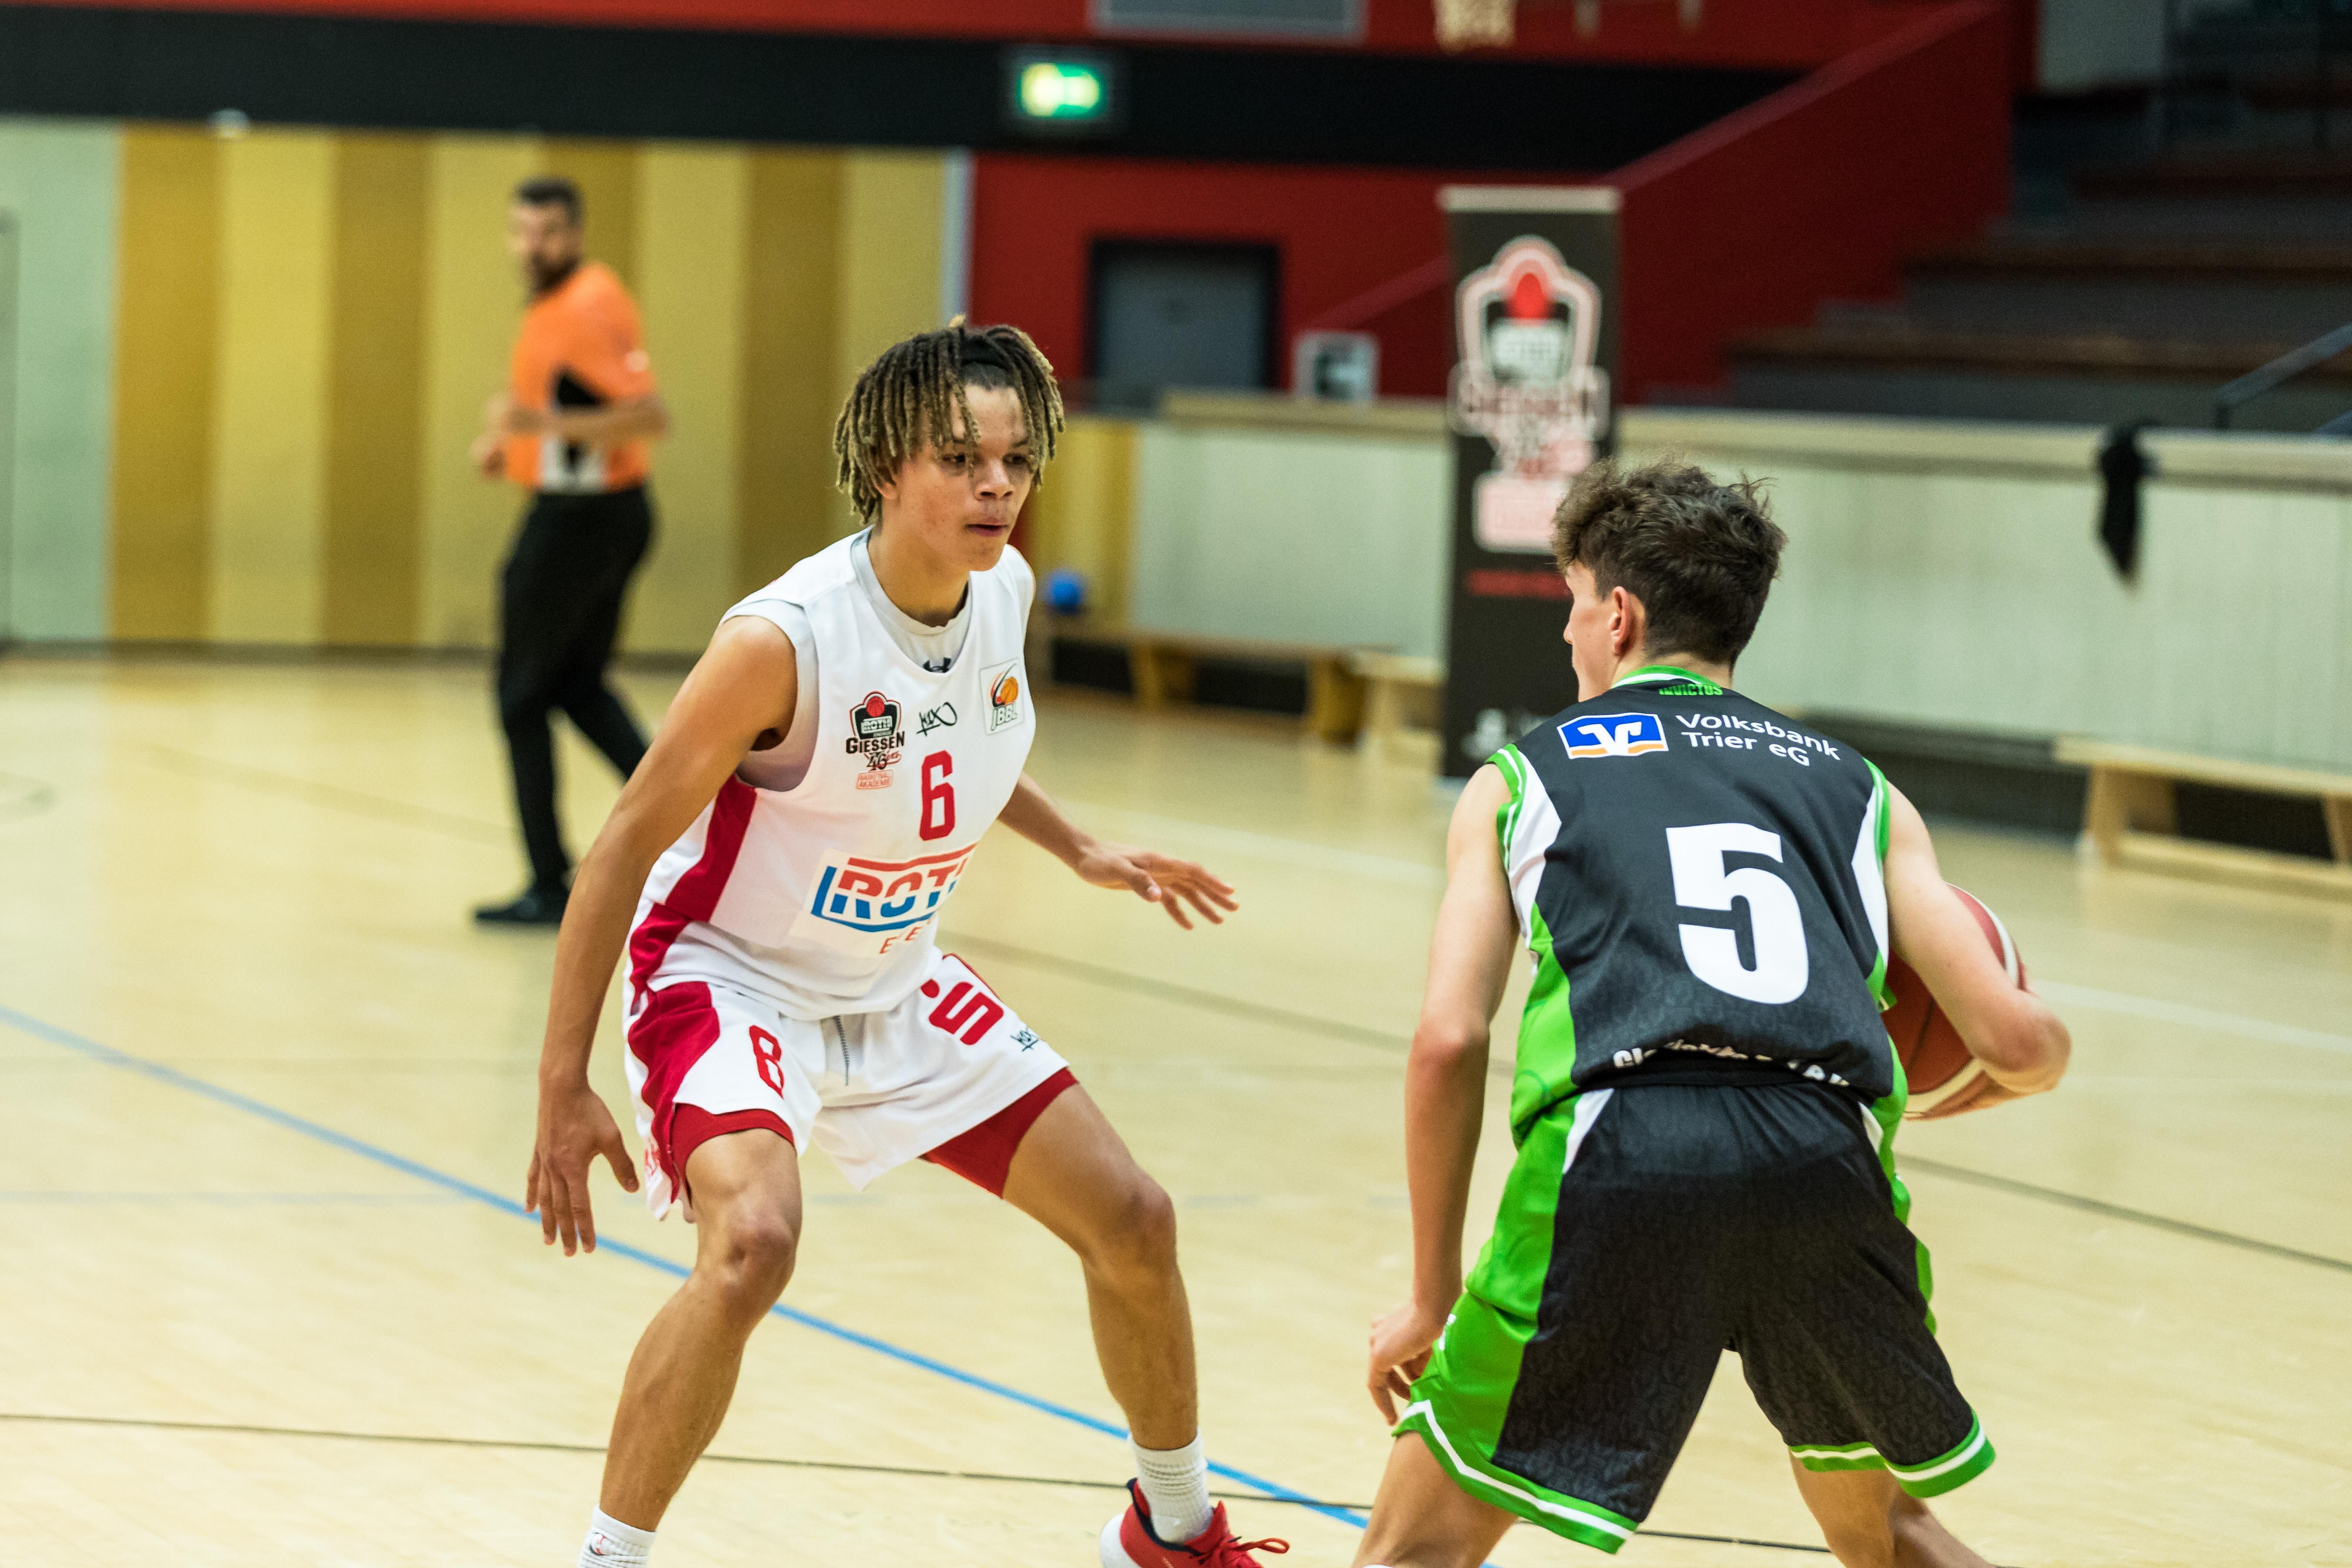 JBBL_20-21_Giessen_Trier_Spieltag2_Detwan-Andrews_2